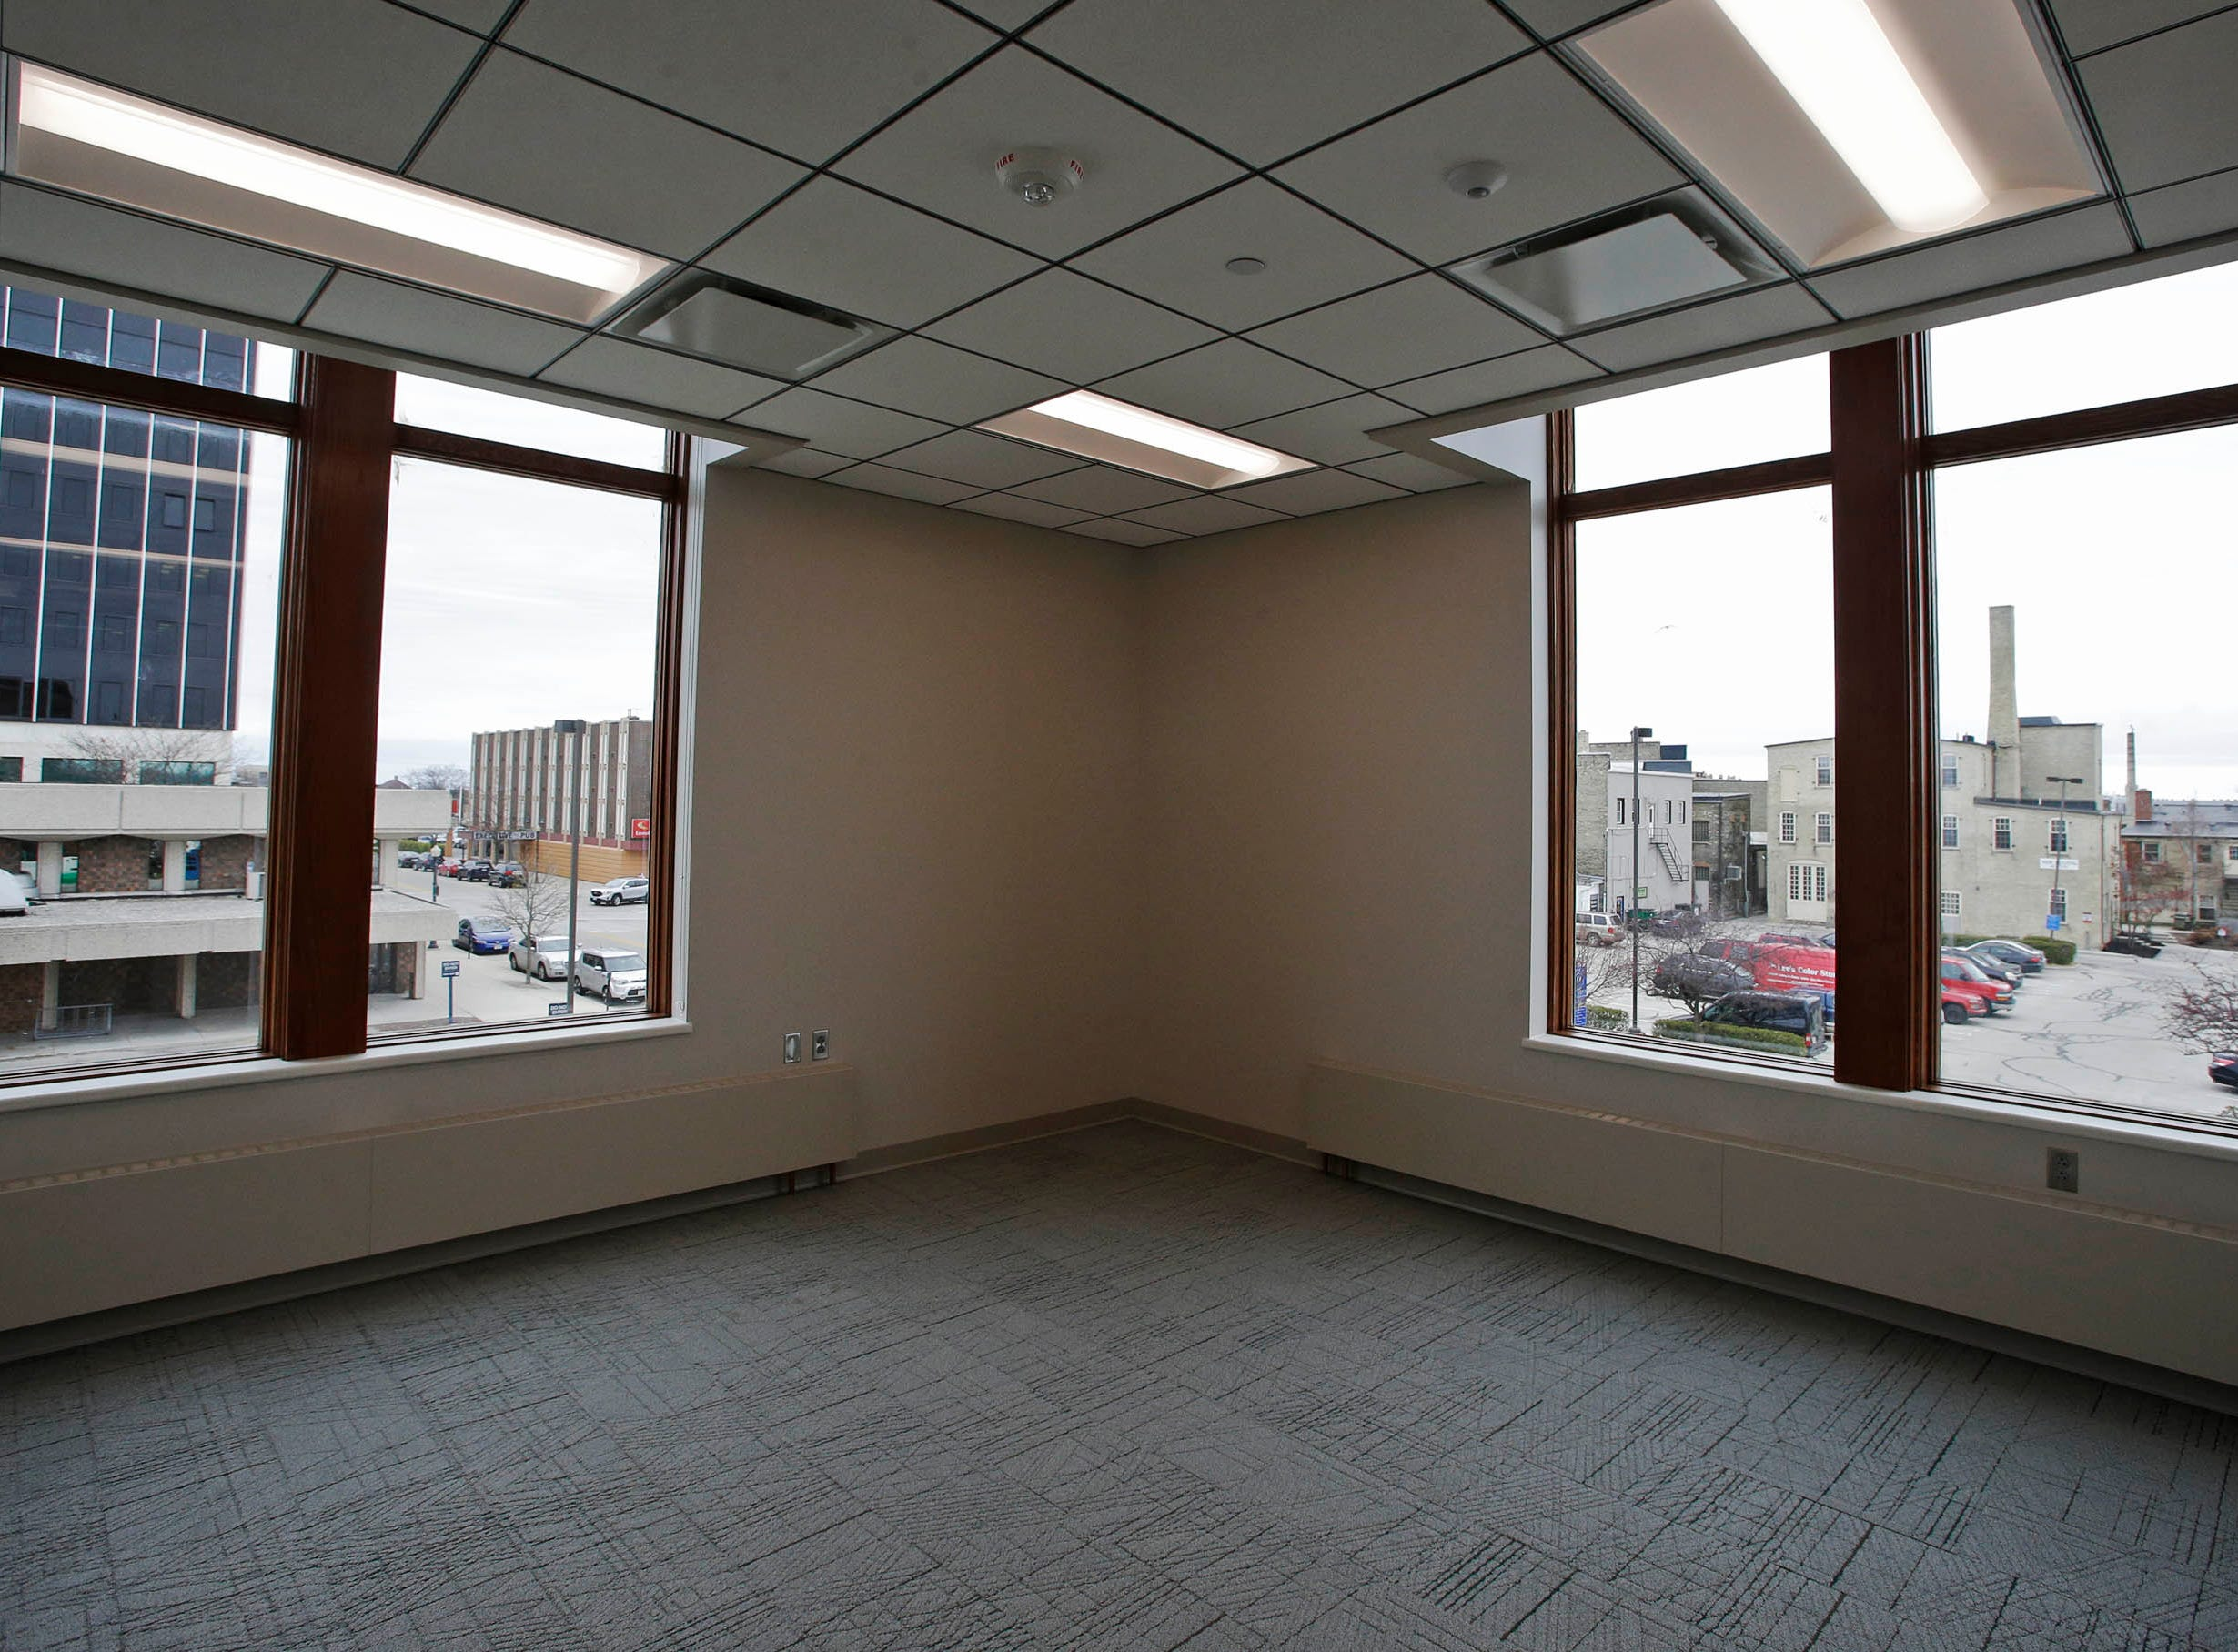 A view from the Sheboygan City Hall to downtown Sheboygan, Tuesday, May 7, 2019, in Sheboygan, Wis.